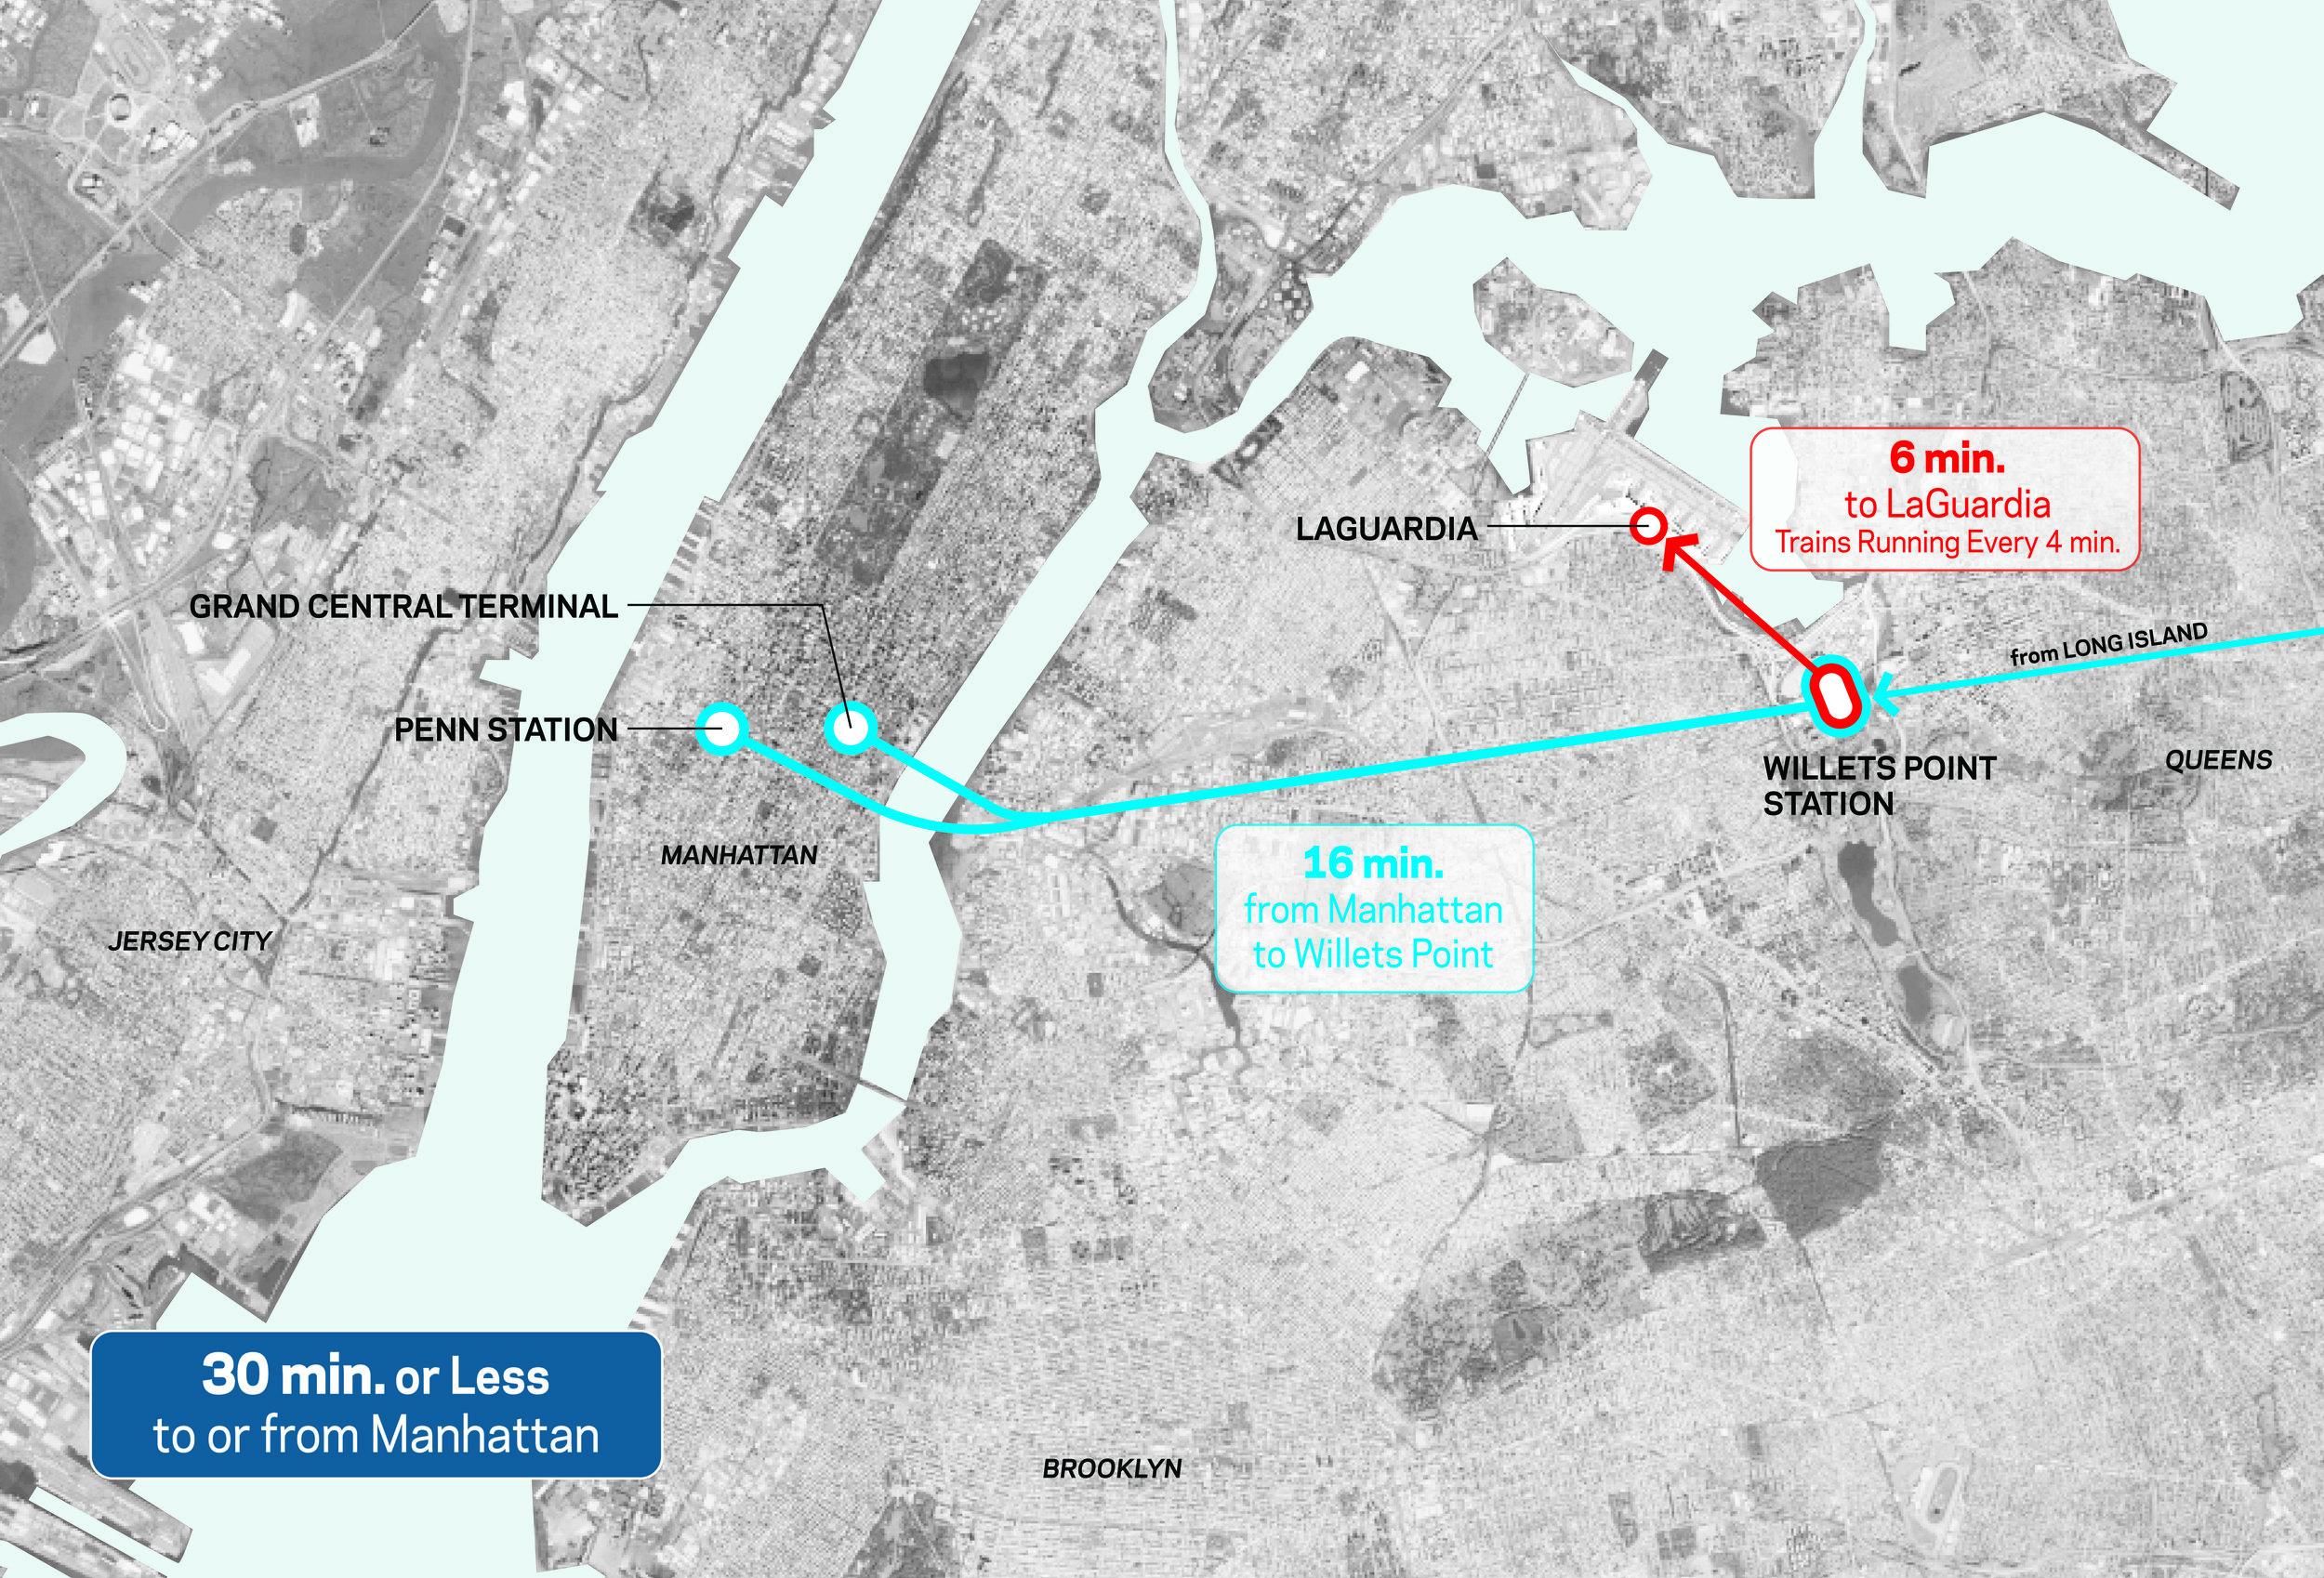 20180624_LGA_NYC Map_R7_LI_STRAIGHT_highres.jpg